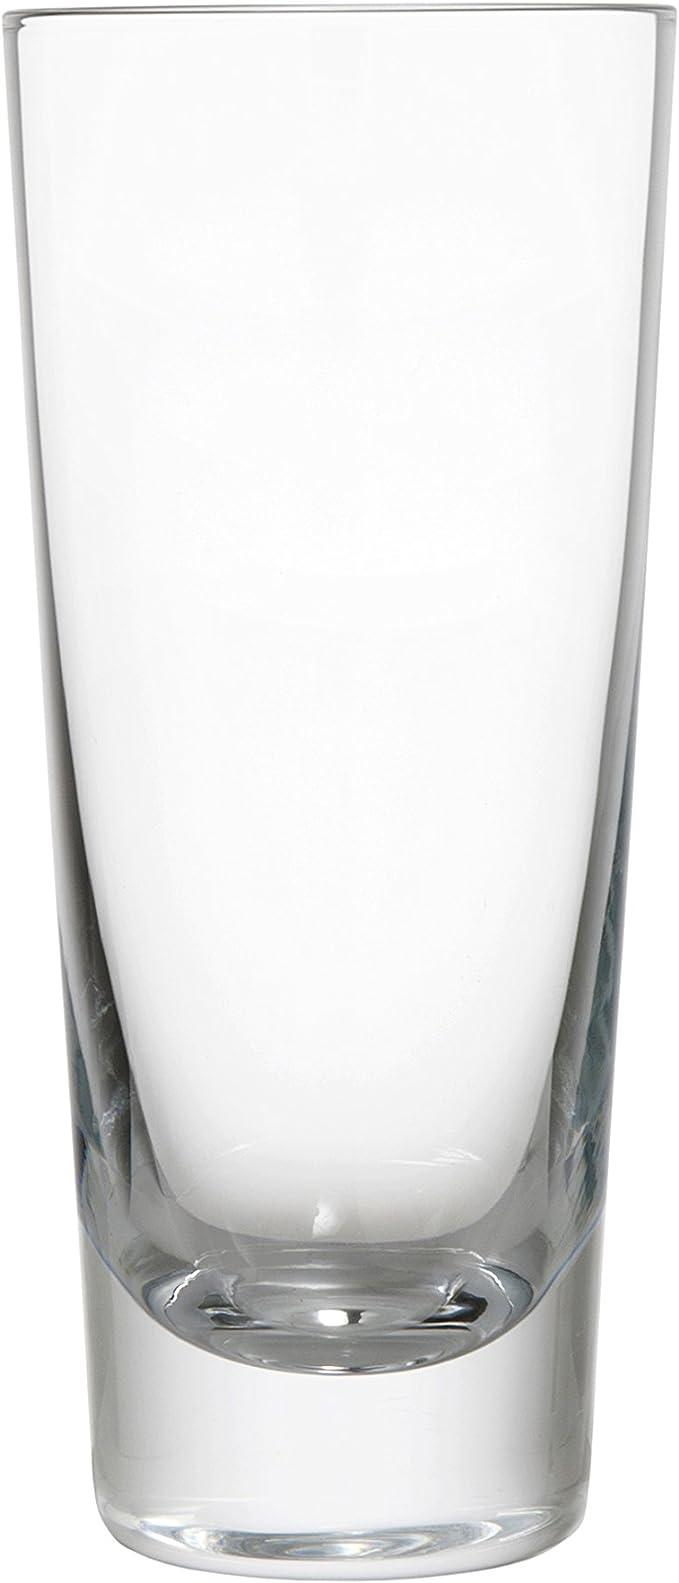 Amazon Com Schott Zwiesel Tritan Crystal Glass Tossa Barware Collection Beer Tumbler Highball Glass 8 3 Ounce Set Of 6 Kitchen Dining